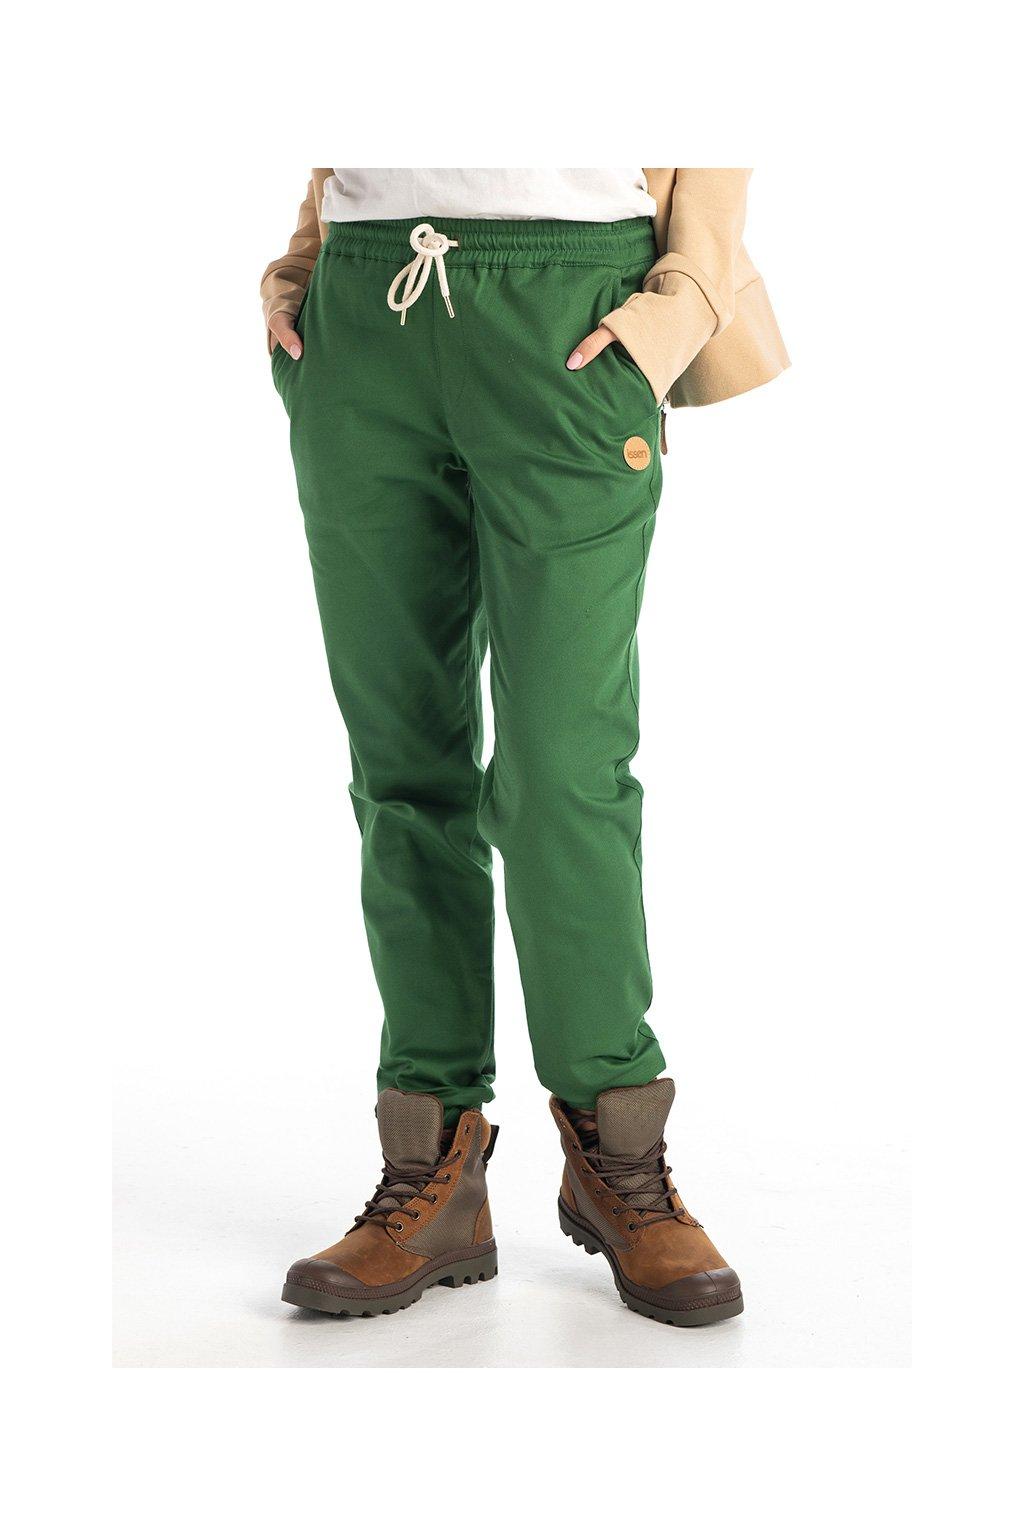 Kalhoty jogger sjrp 70 1